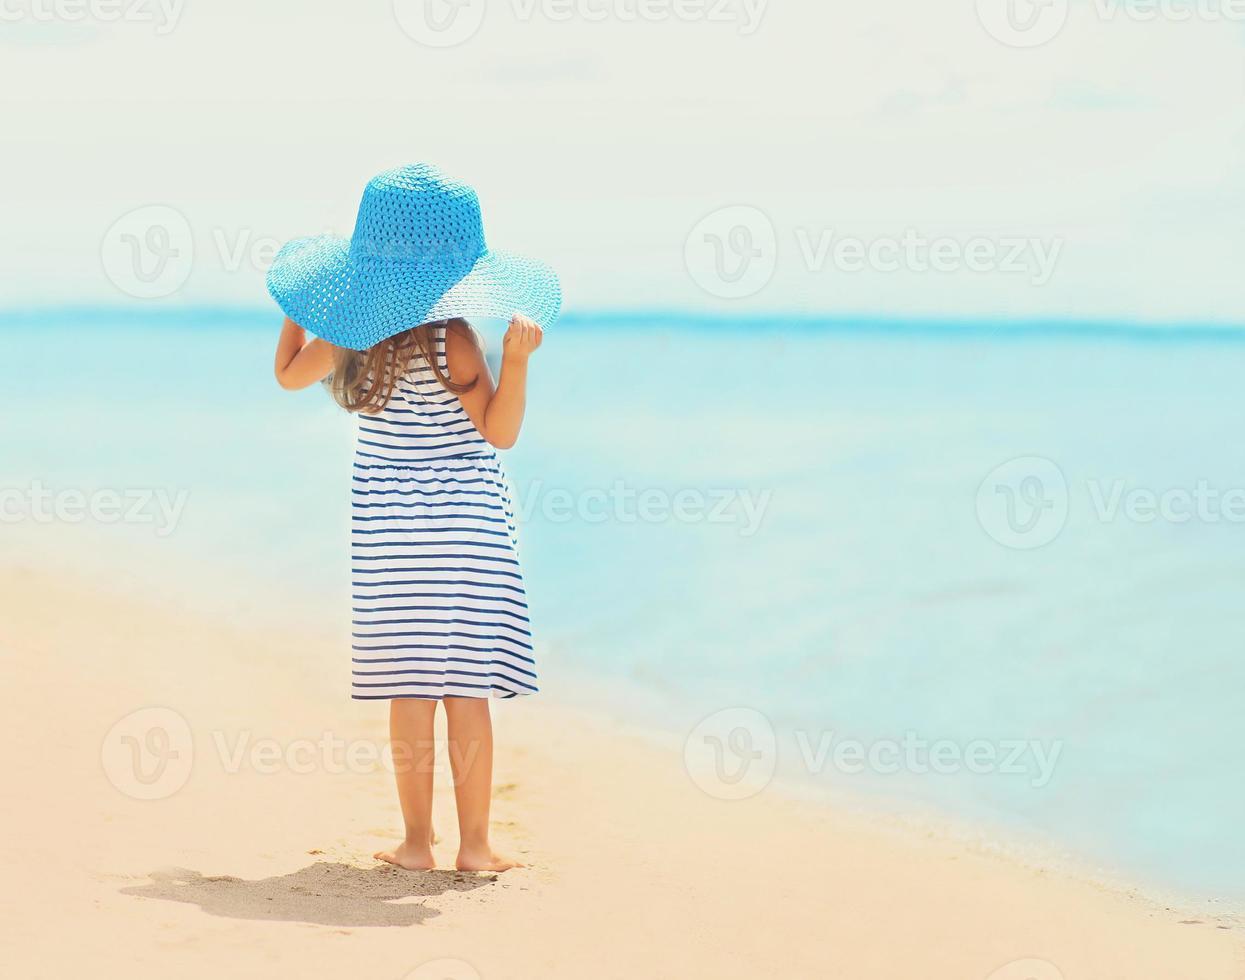 menina bonita no vestido e chapéu de palha, apreciando o mar foto